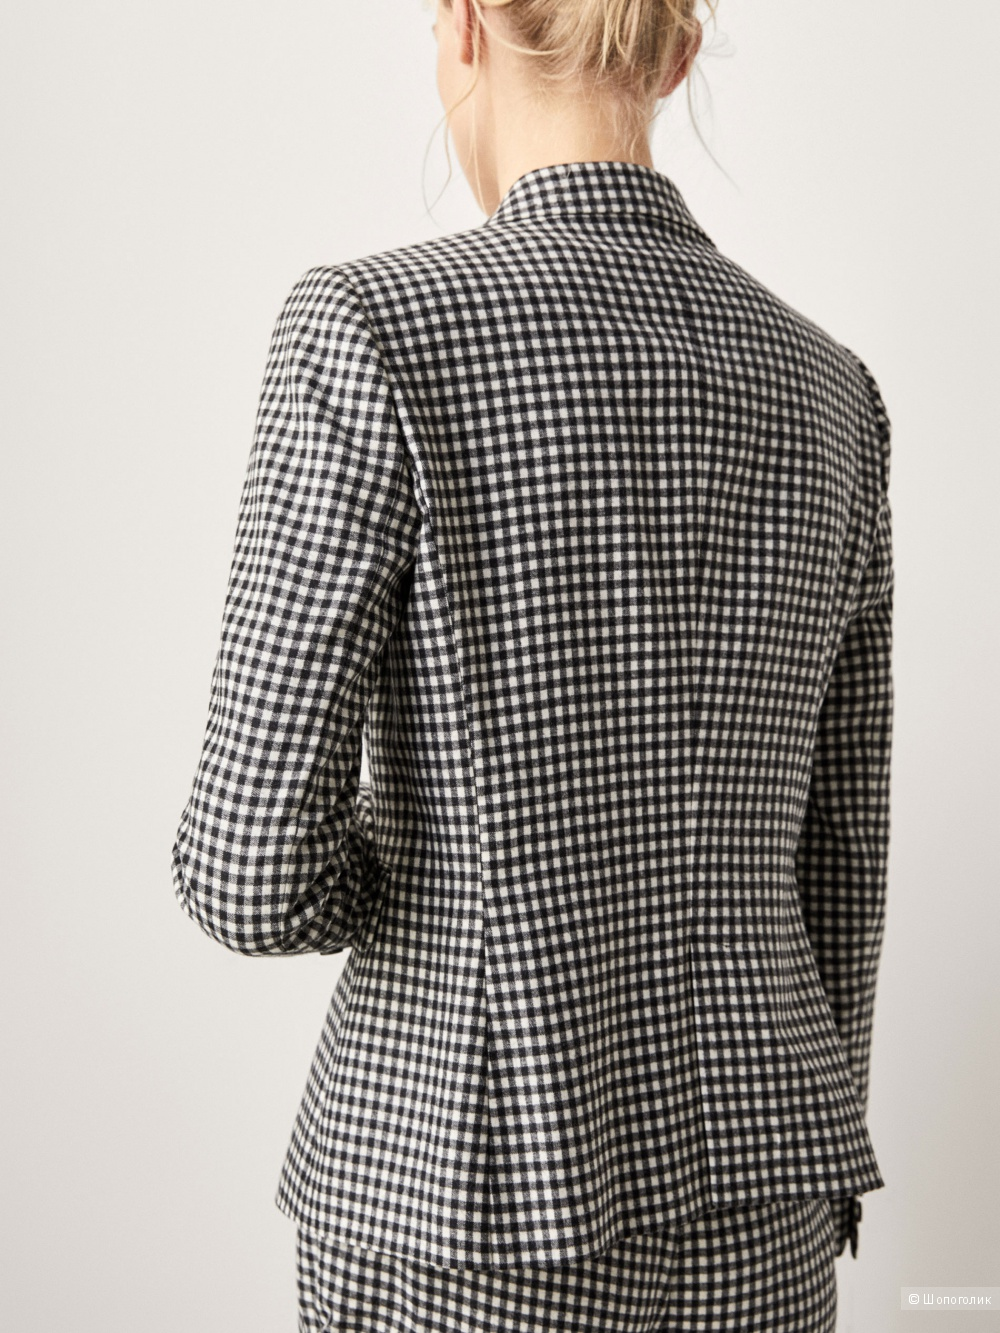 Пиджак Massimo dutti, размер 36 (42-44)